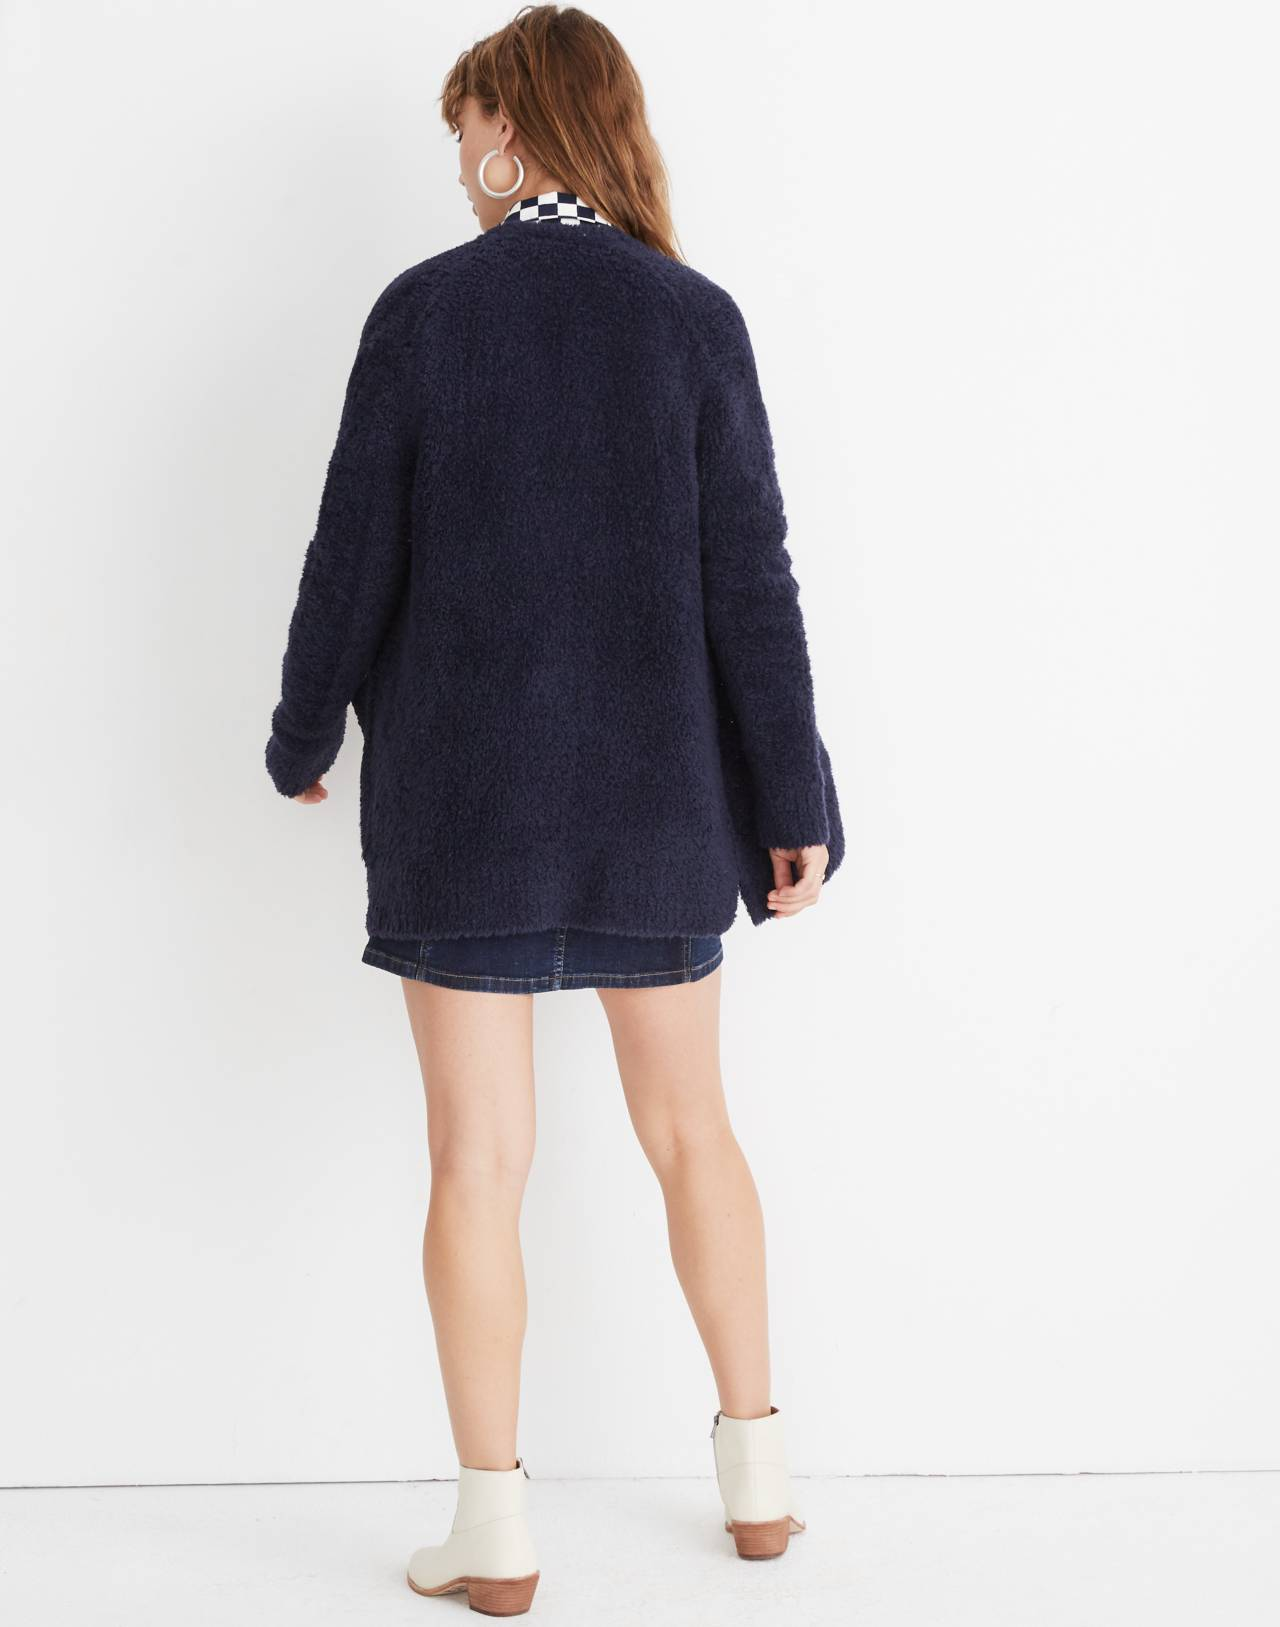 Teddy Cardigan Sweater in dark navy image 2